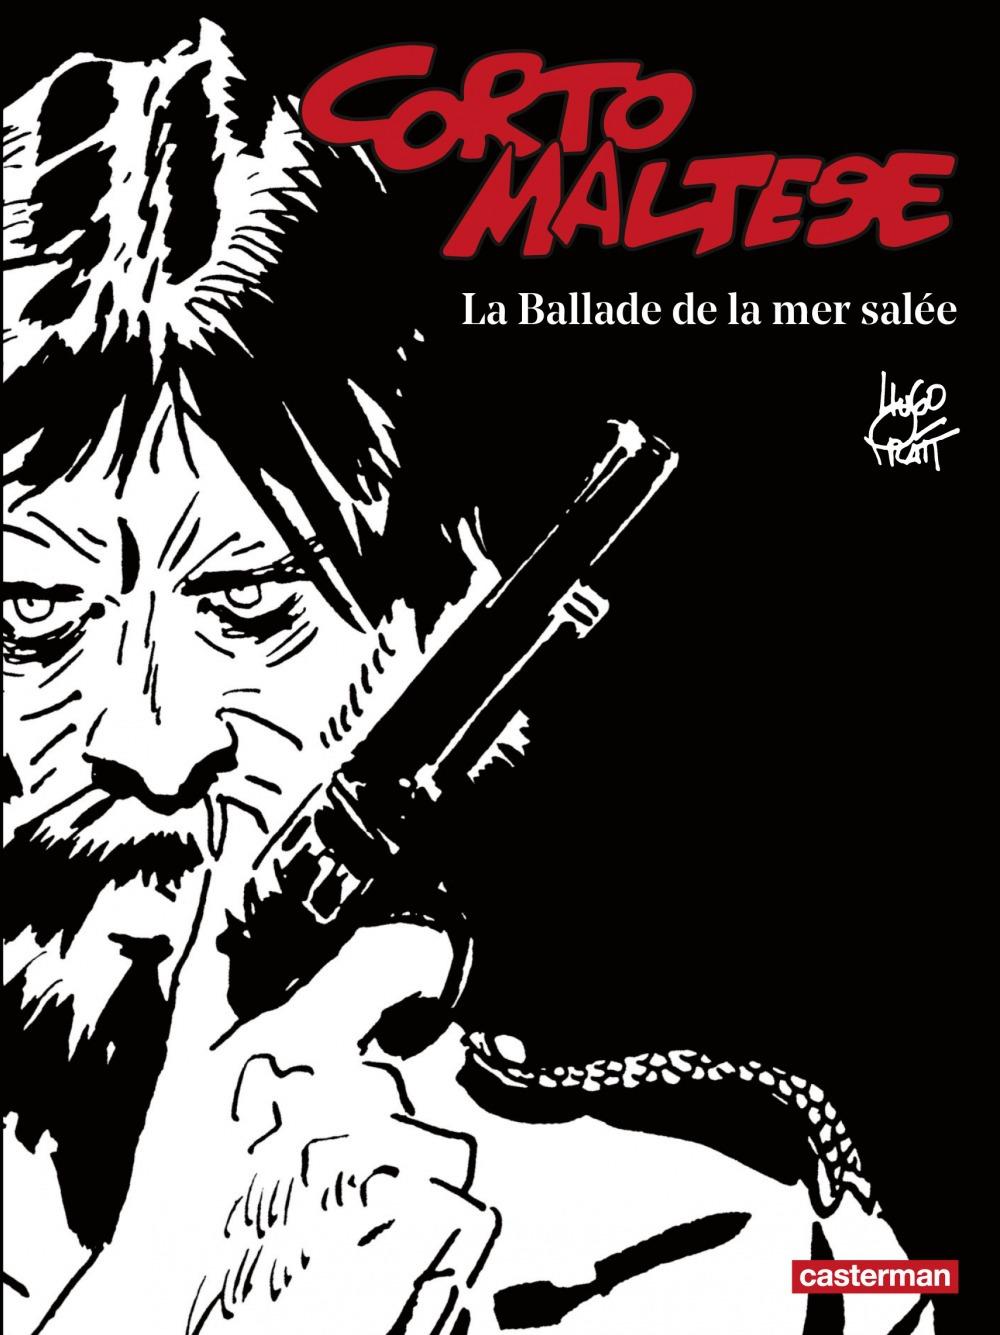 Hugo Pratt Corto Maltese (Tome 1) - La Ballade de la mer salée (édition enrichie noir et blanc)